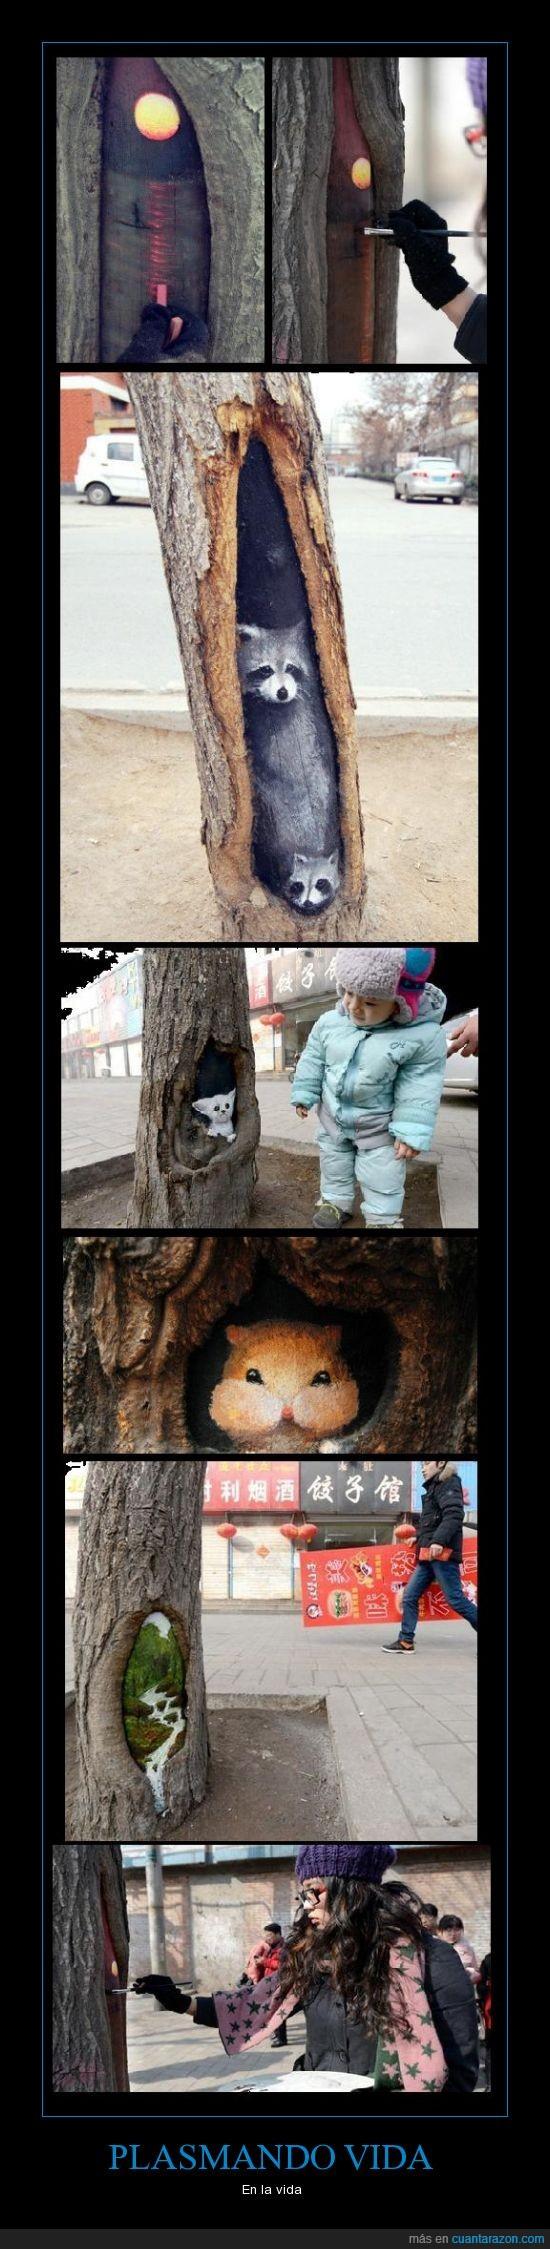 animales,árboles,arte,decorar,dibujo,lago,mapache